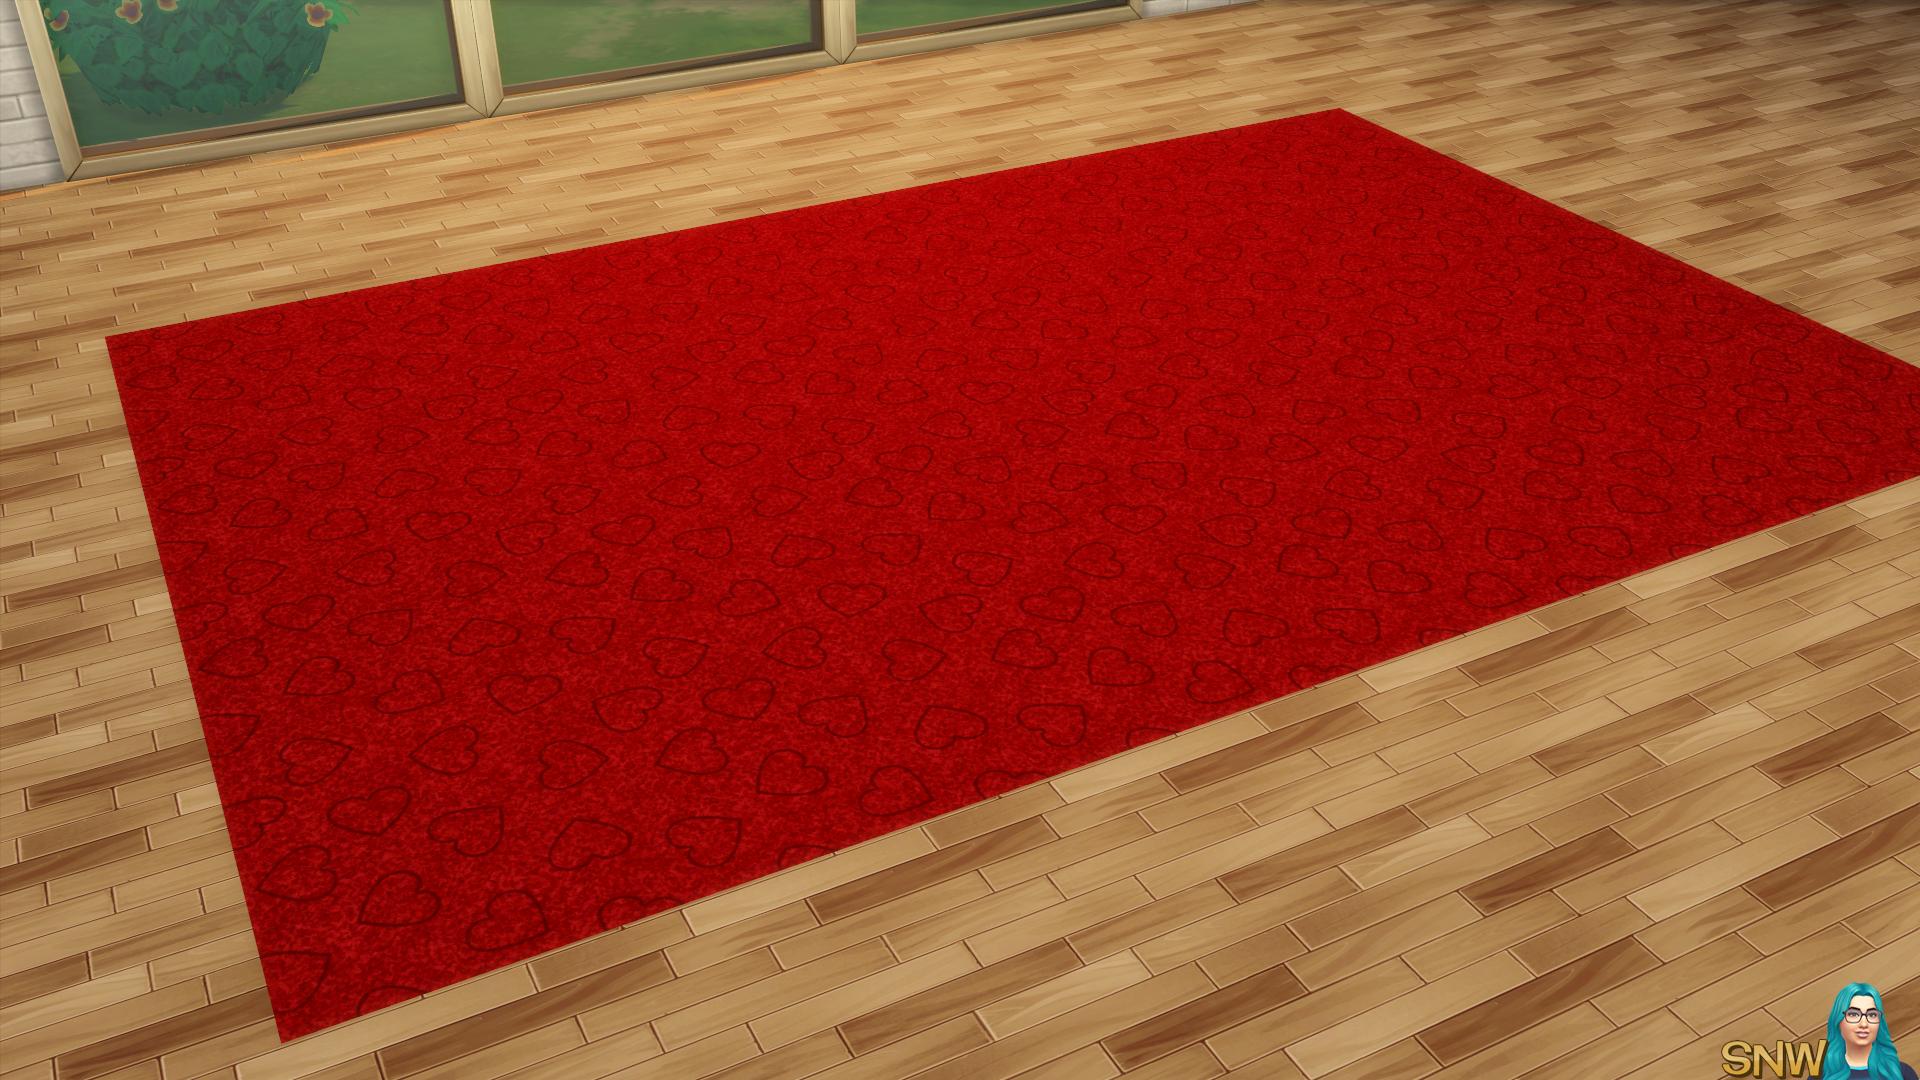 Valentine's Day 2018 / Love Carpets #9 (Hearts - Outline - Small - Dark)